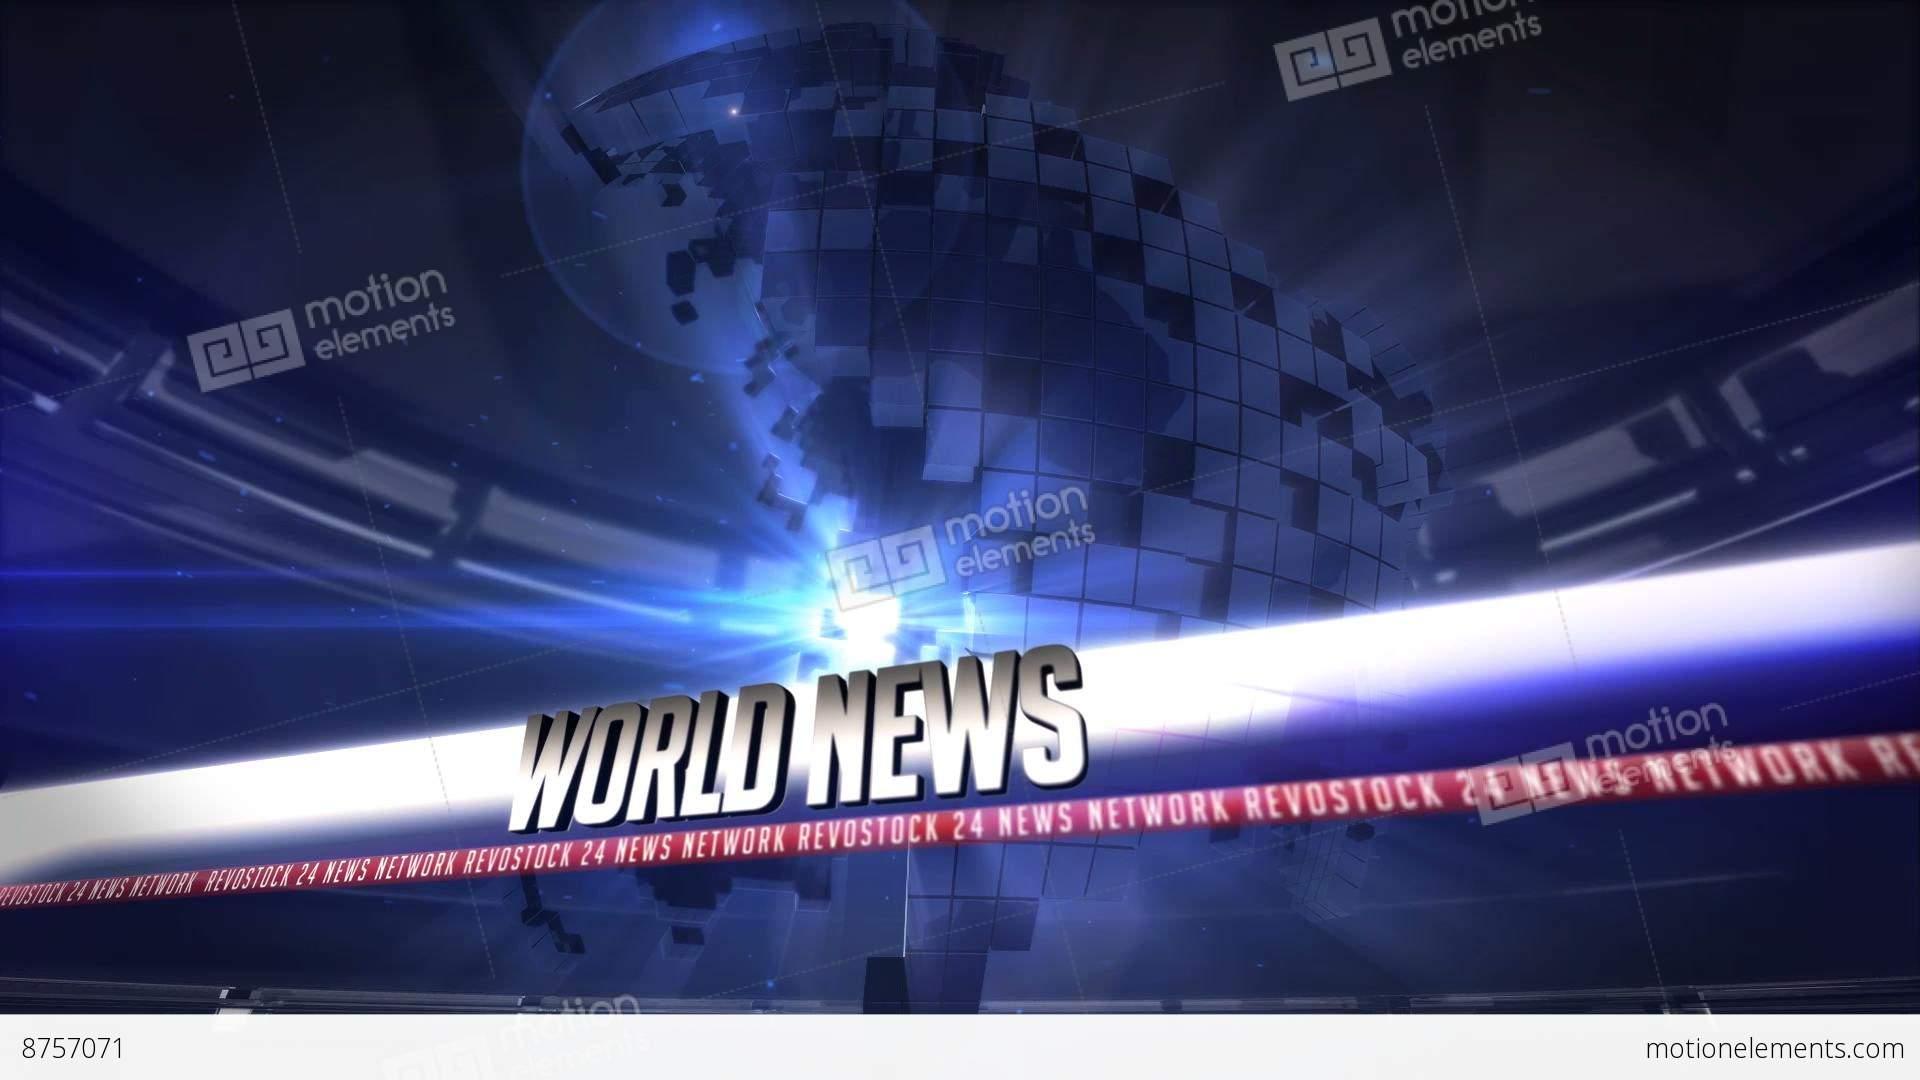 broadcast news 24 after effects templates 8757071. Black Bedroom Furniture Sets. Home Design Ideas